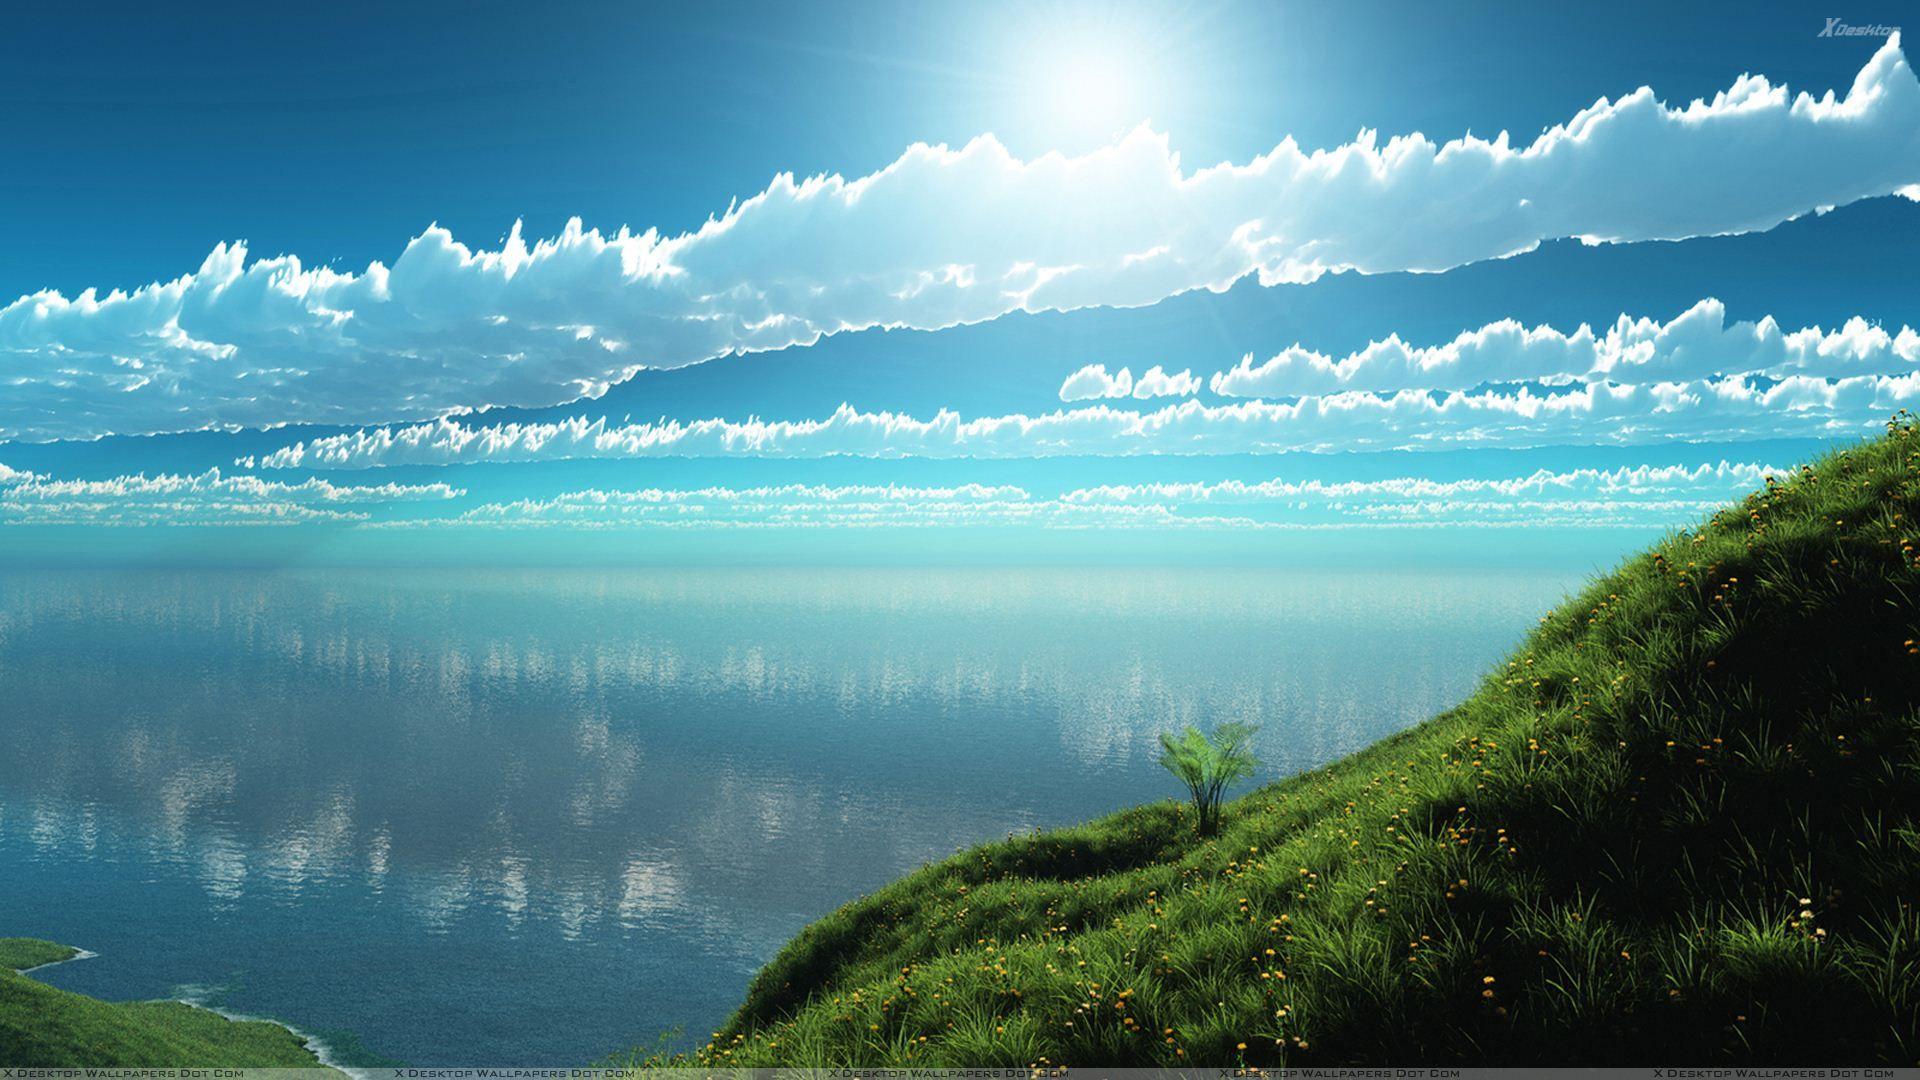 Beautiful Morning Scene Near Sea Wallpaper Gambar